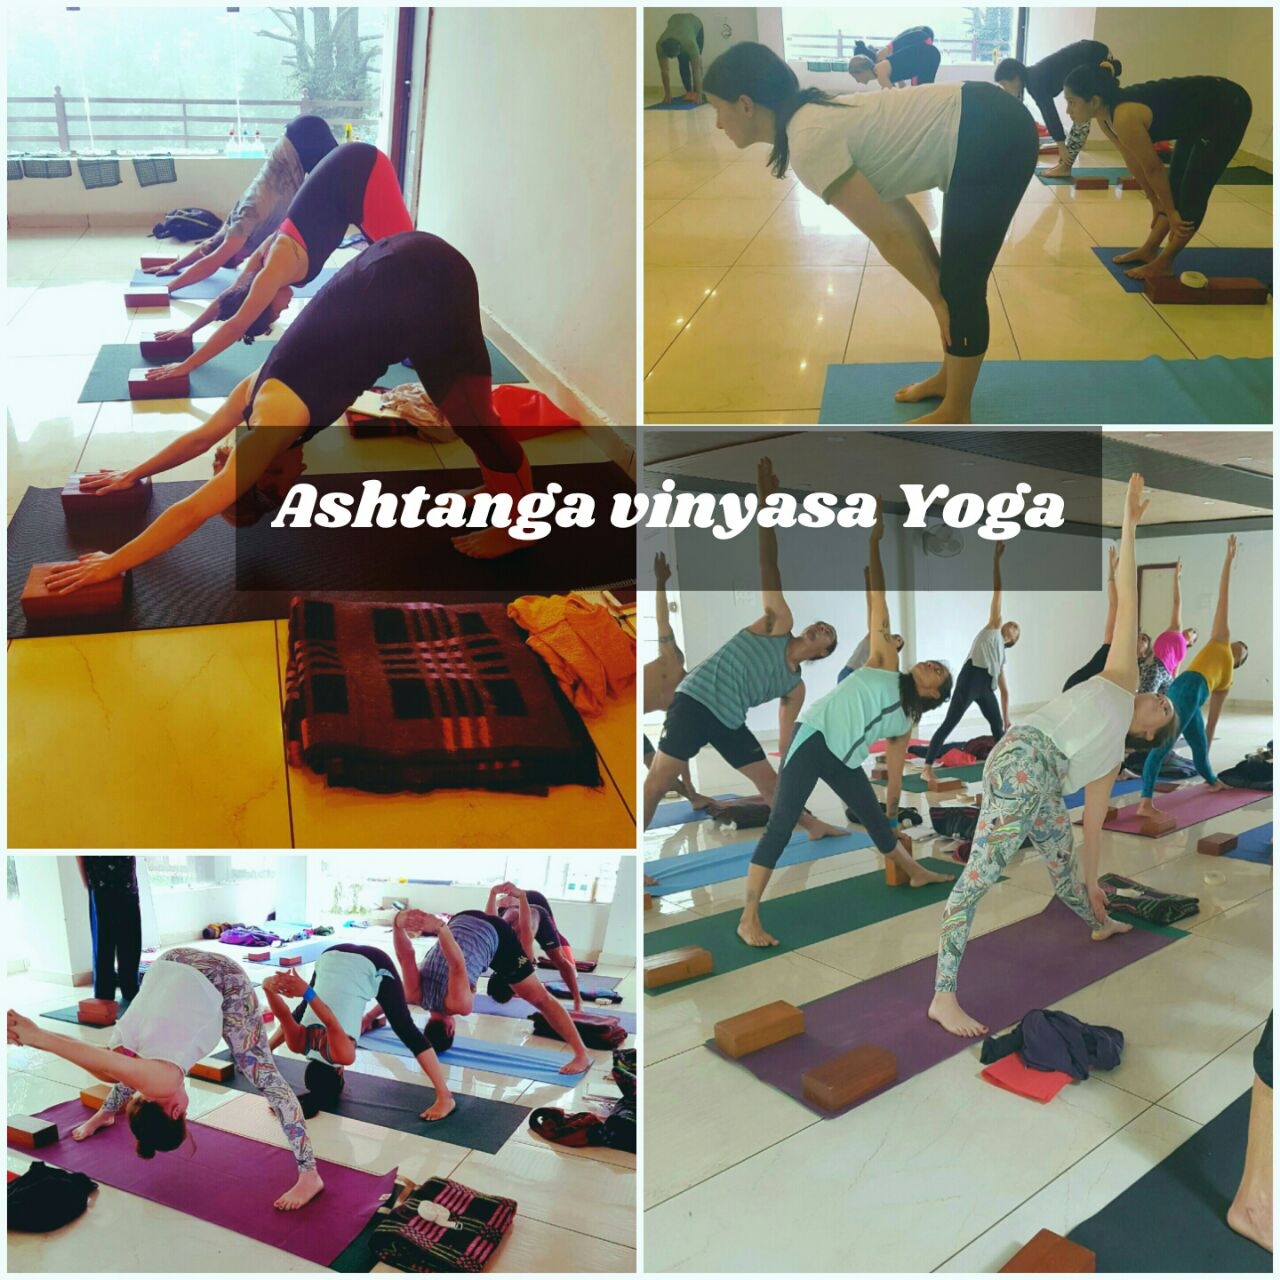 Ashtanga Vinyasa Yoga training